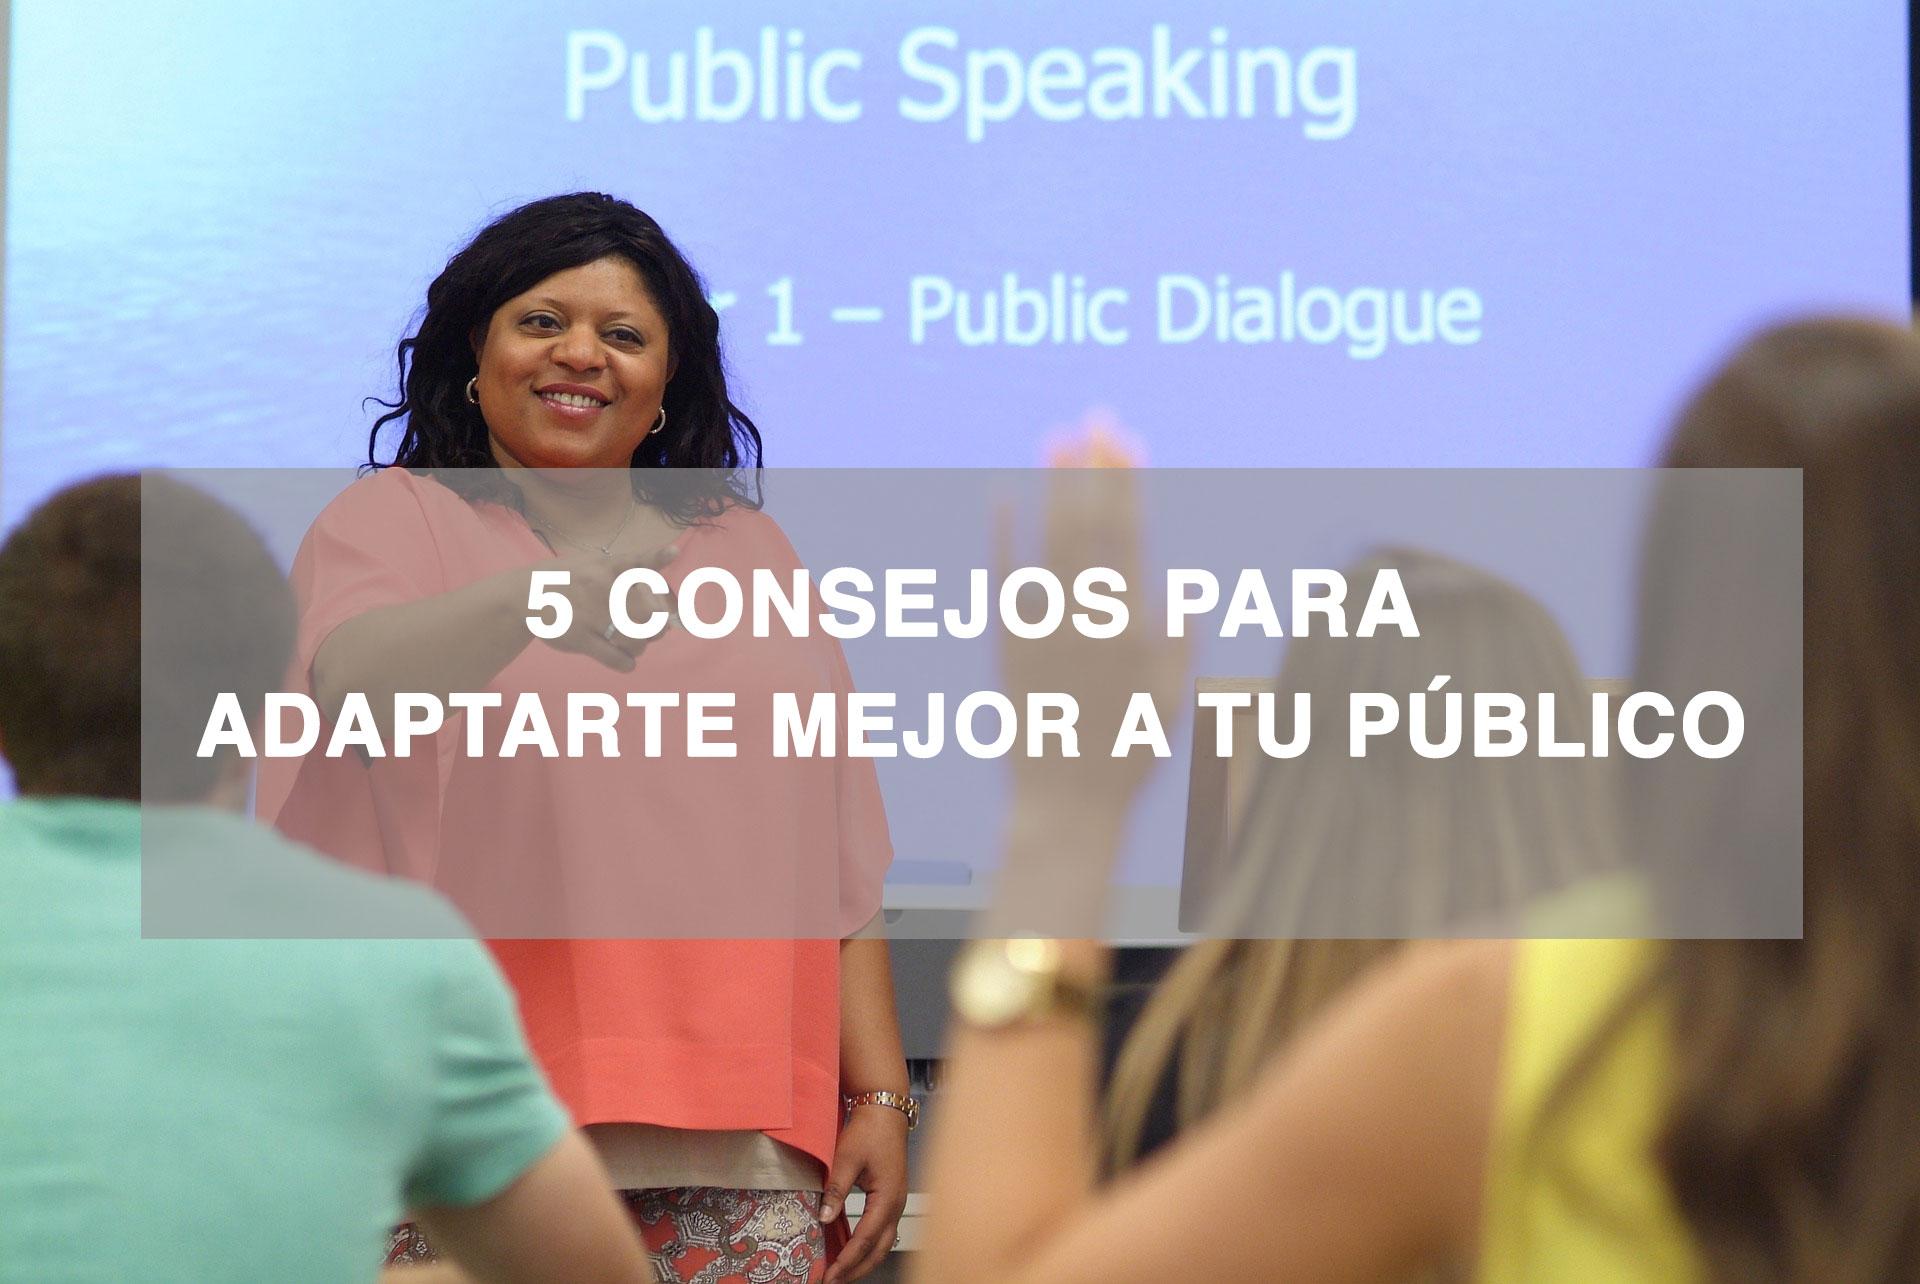 Cinco consejos para adaptarte mejor a tu público